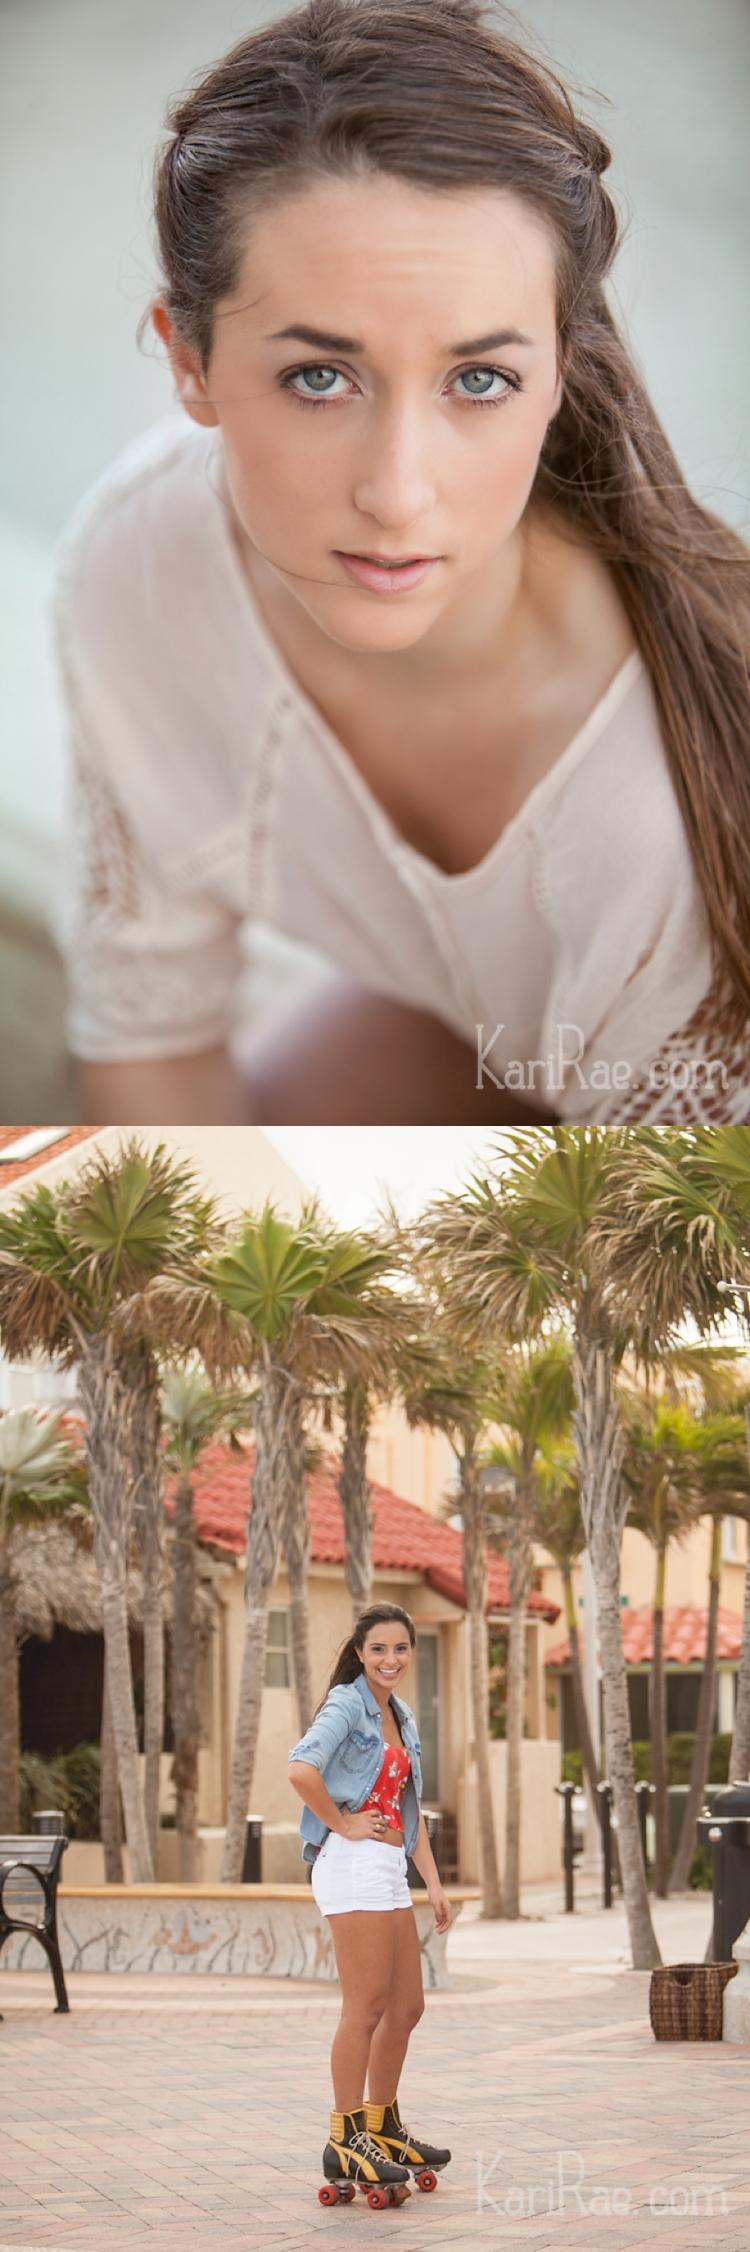 kariraephotography-Florida-Seniors_0004.jpg